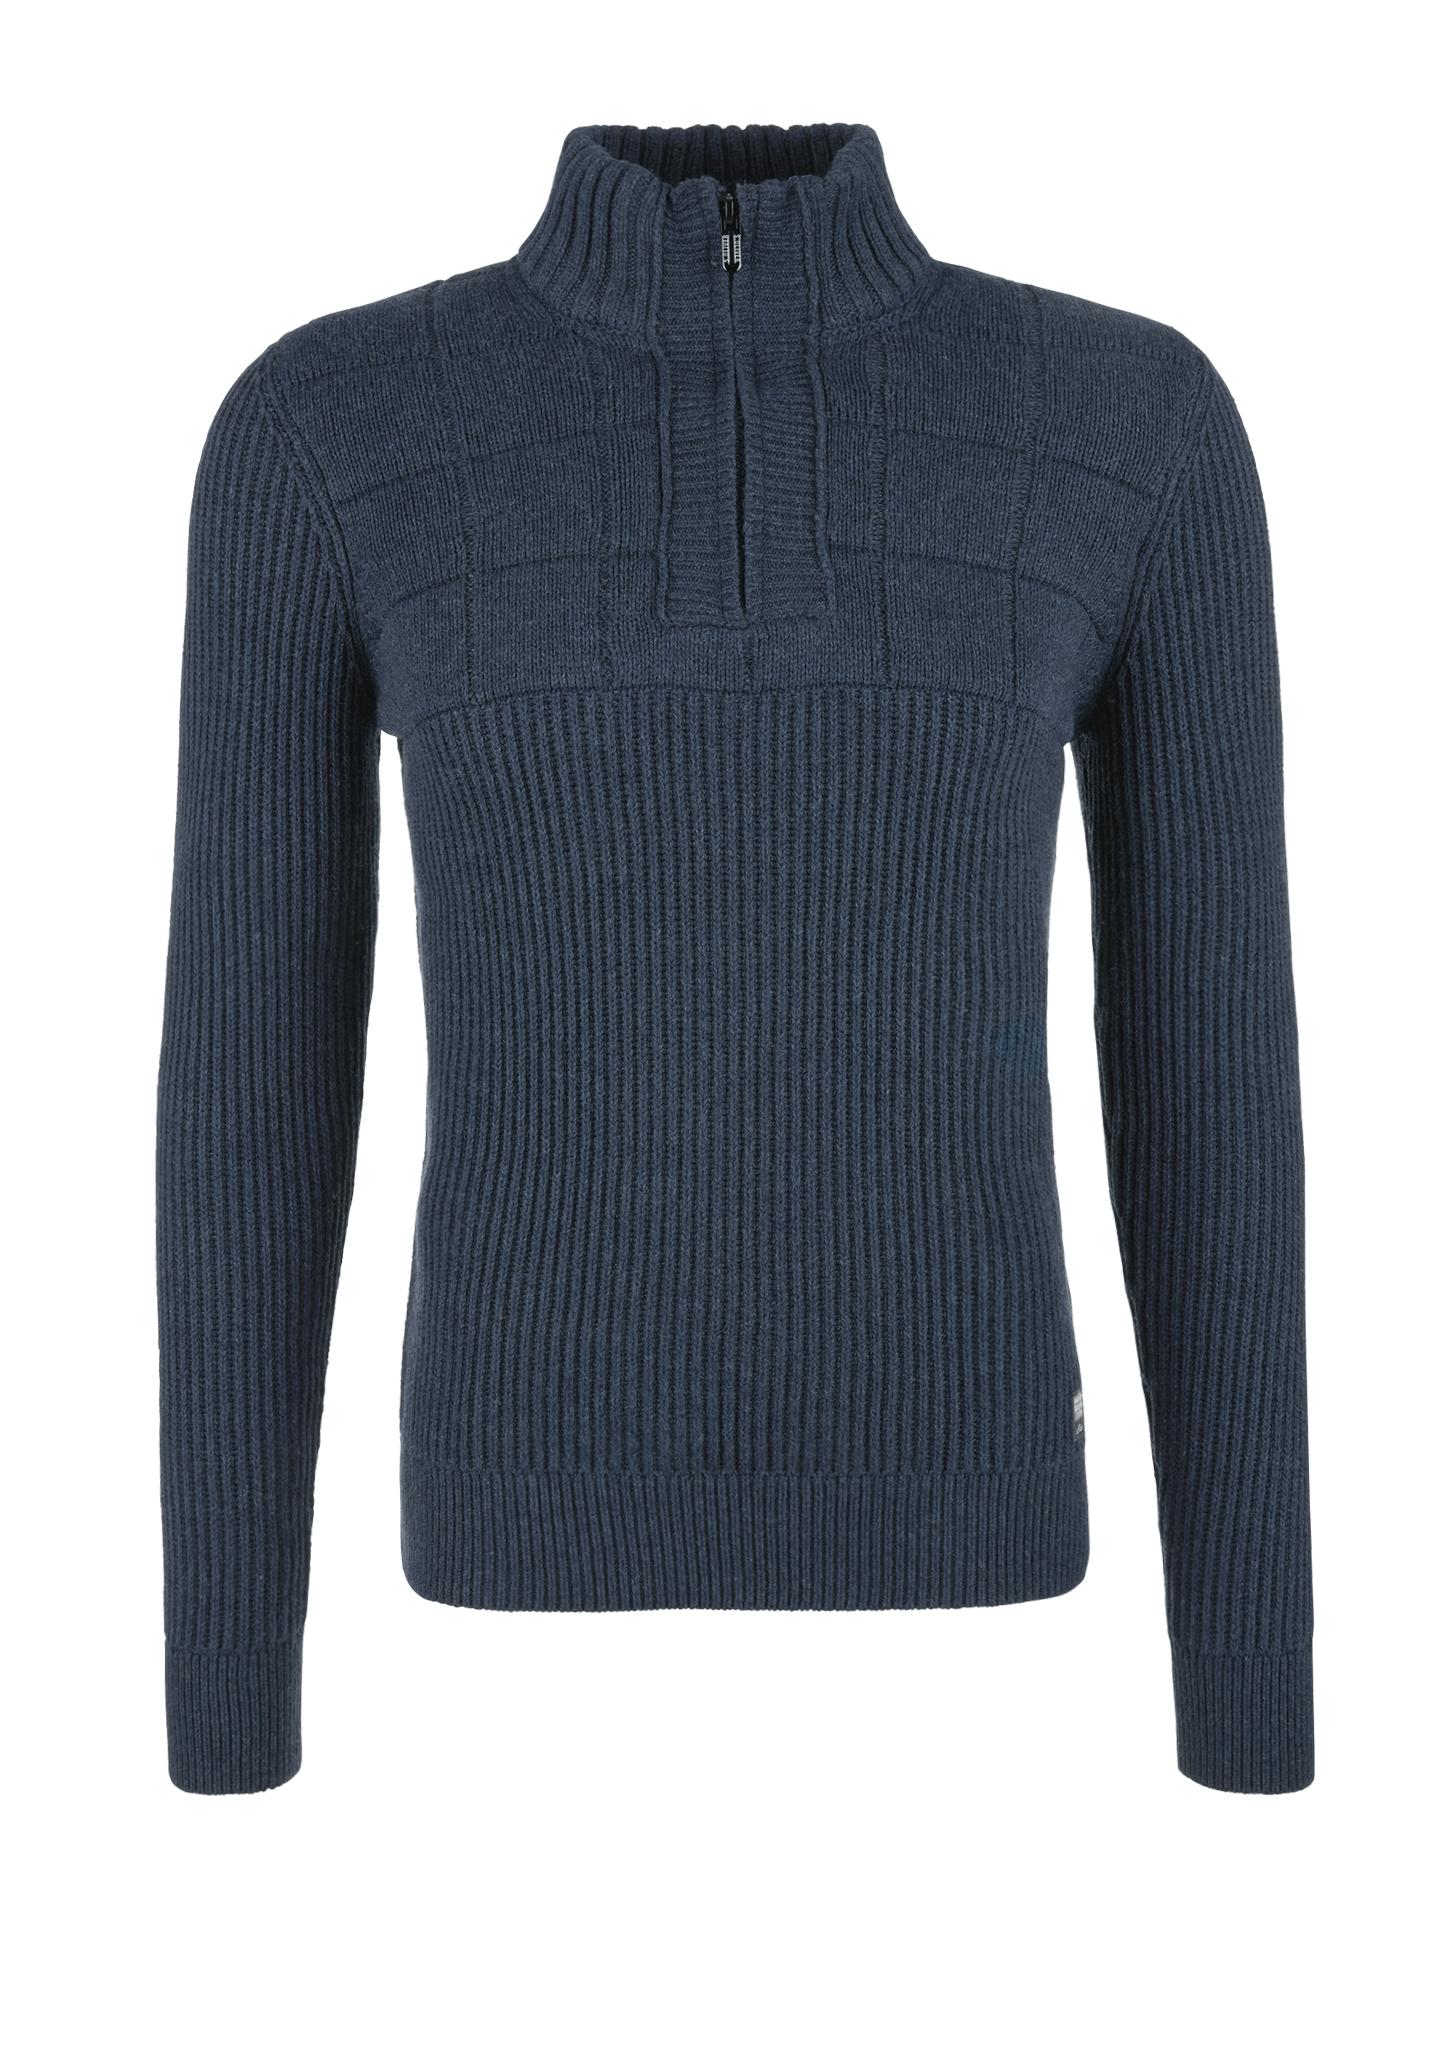 Troyer   Bekleidung > Pullover > Troyer   Blau   55% baumwolle -  35% polyester -  10% polyamid   s.Oliver